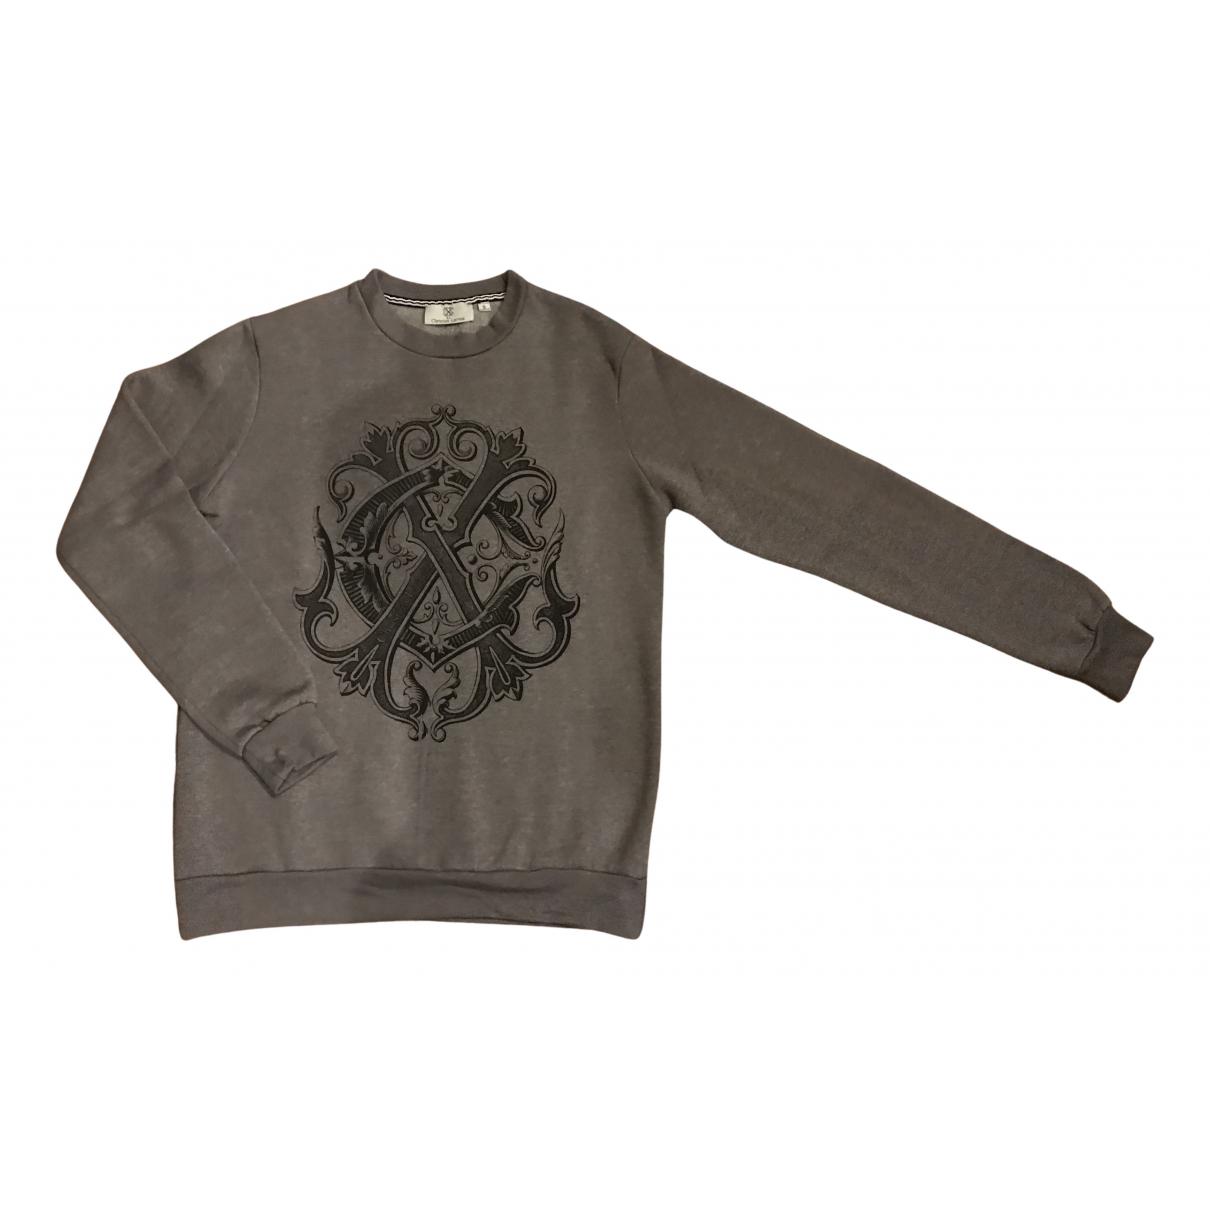 Christian Lacroix N Grey Cotton Knitwear & Sweatshirts for Men S International